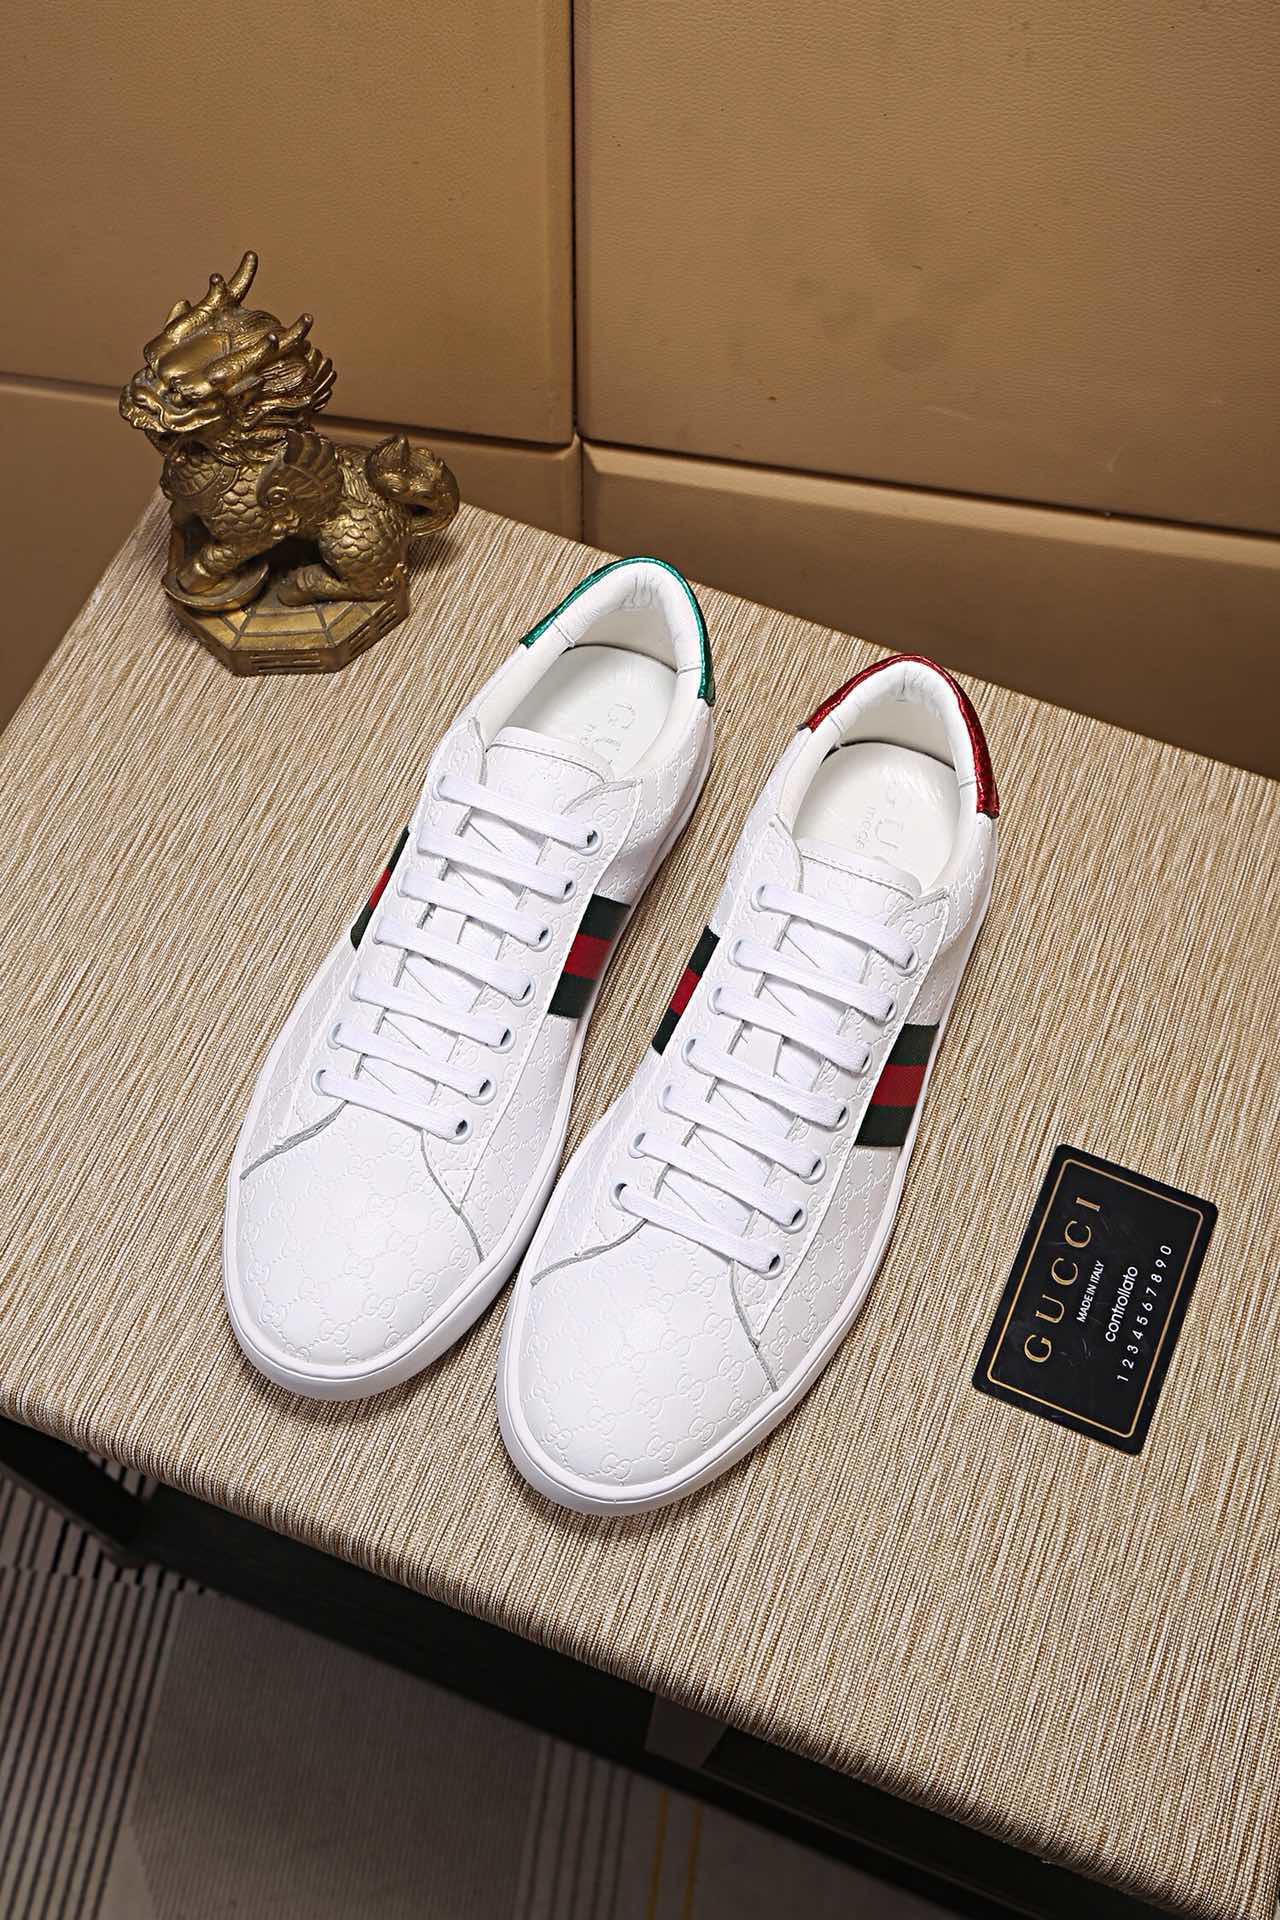 Gucci グッチ 靴 メンズ スーパーコピー 通販日本国内発送